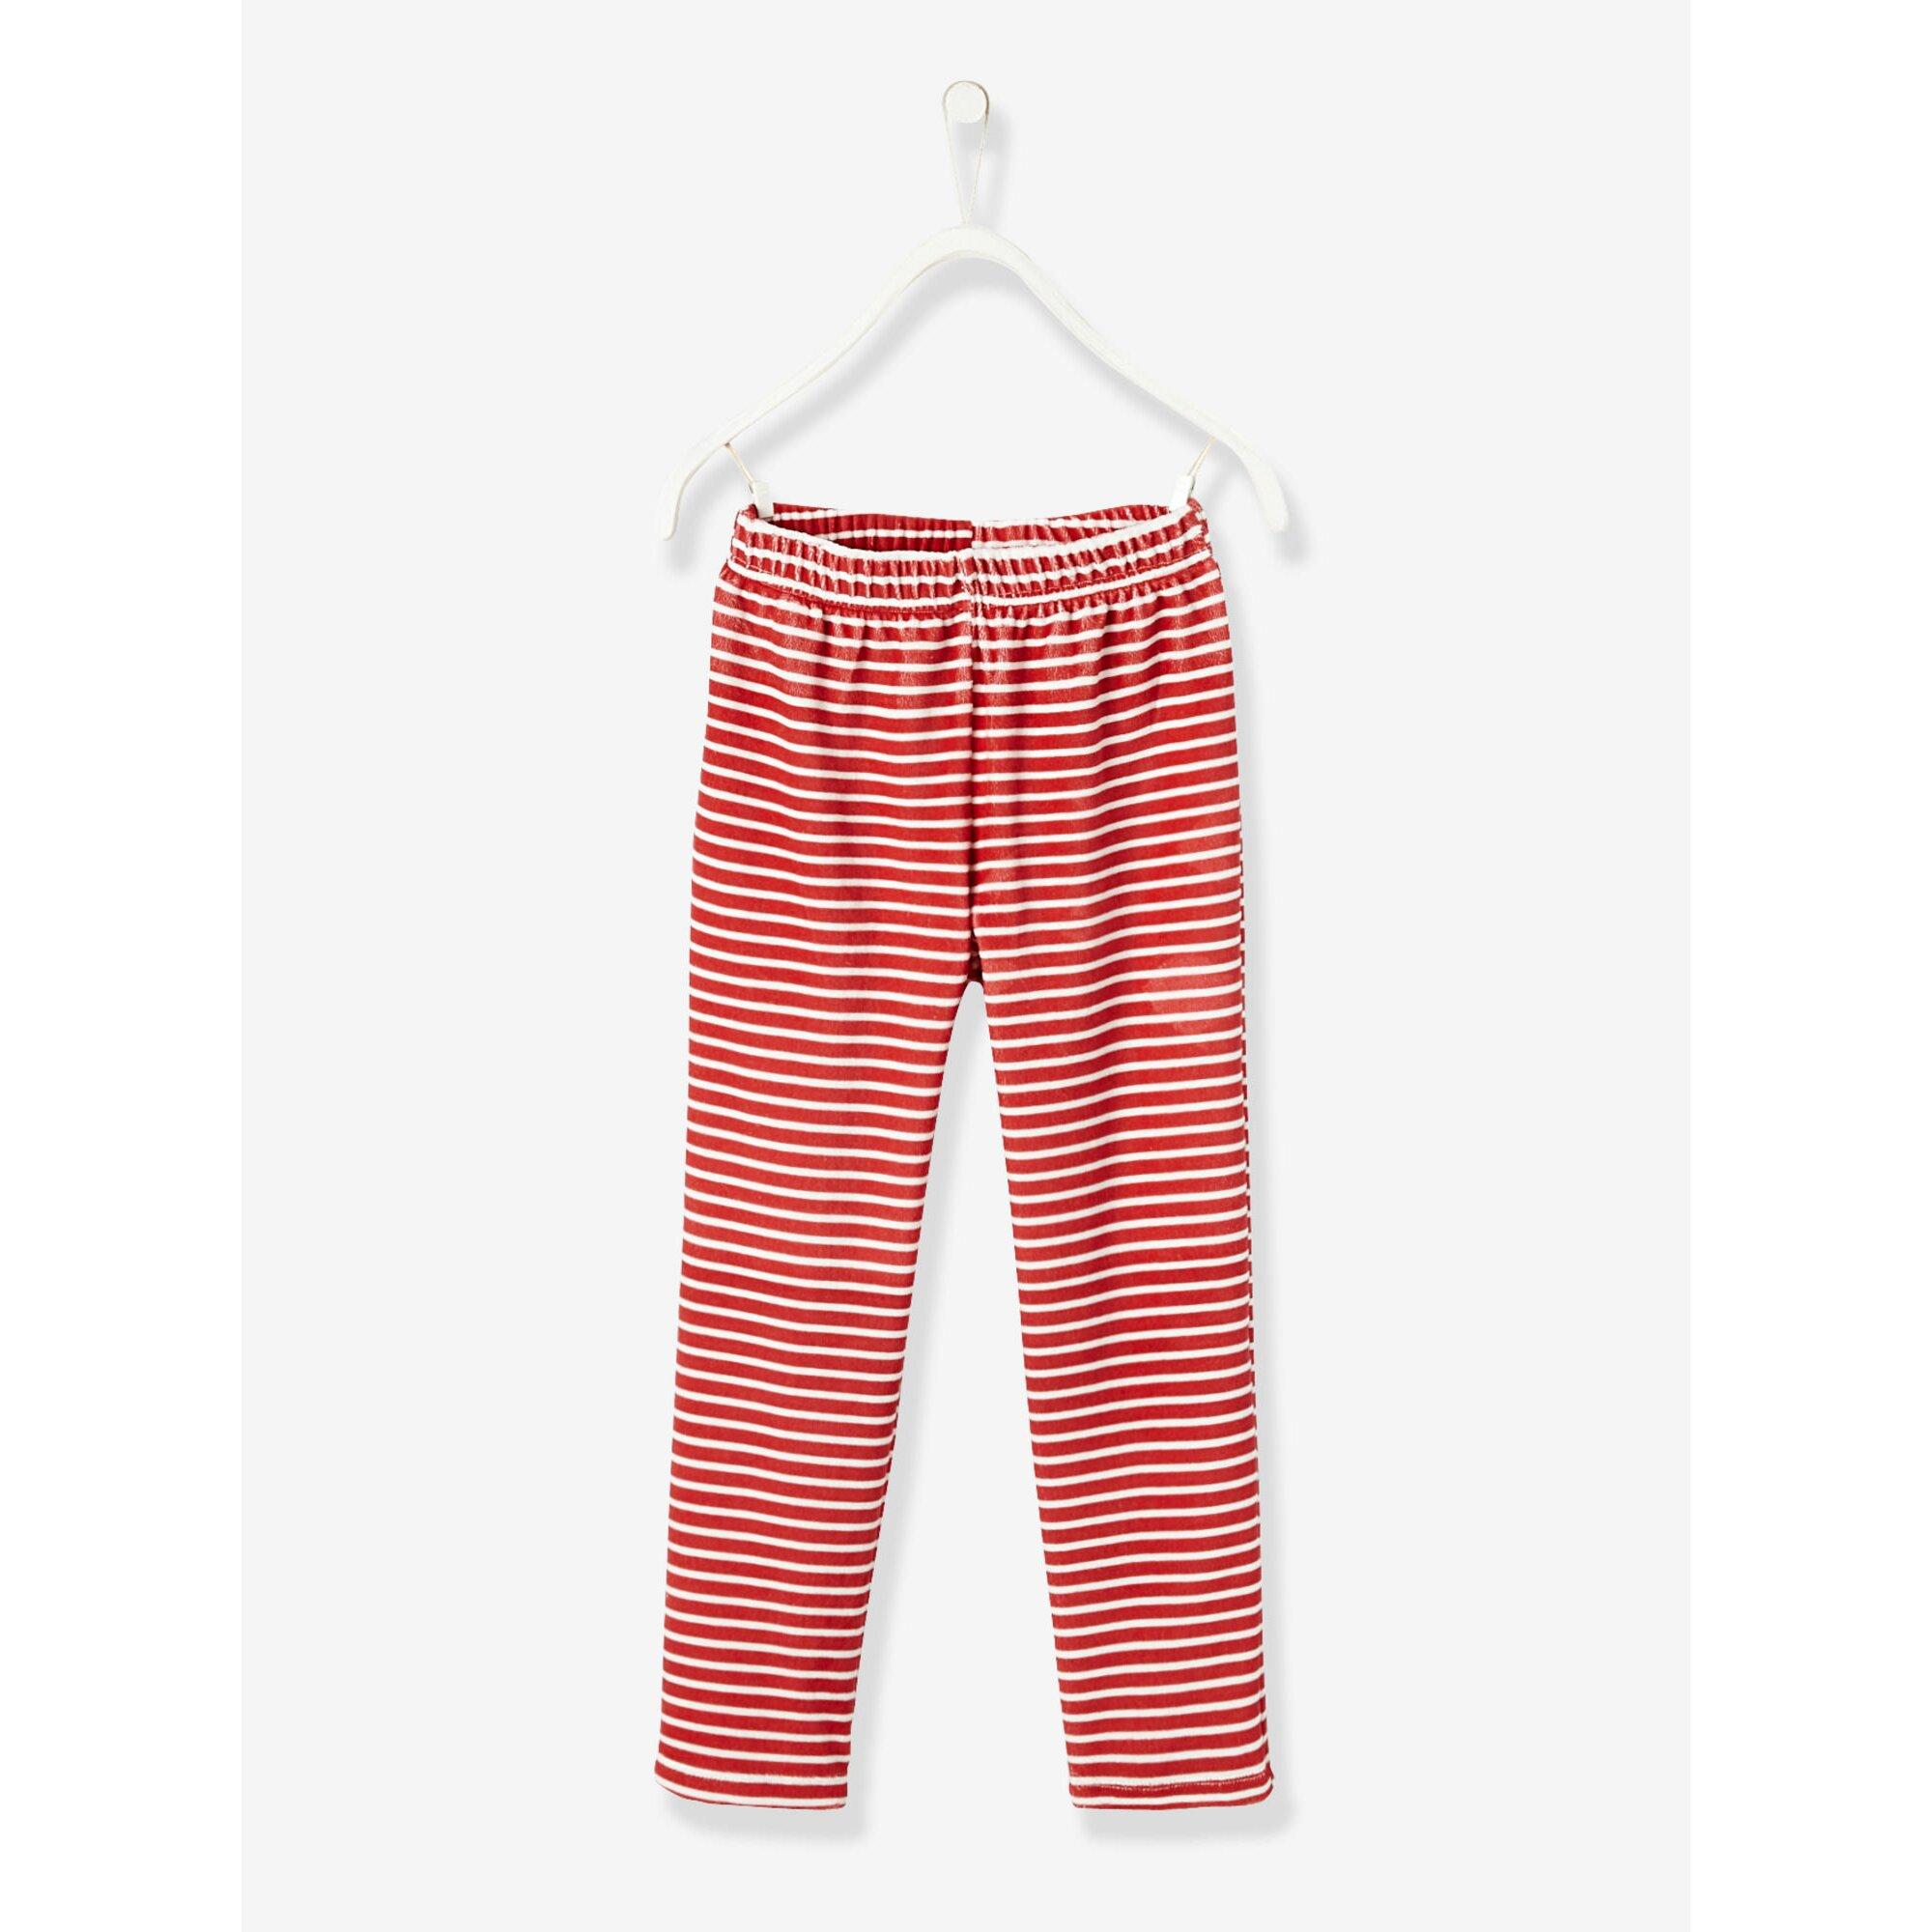 vertbaudet-samt-pyjama-fur-jungen, 23.99 EUR @ babywalz-de